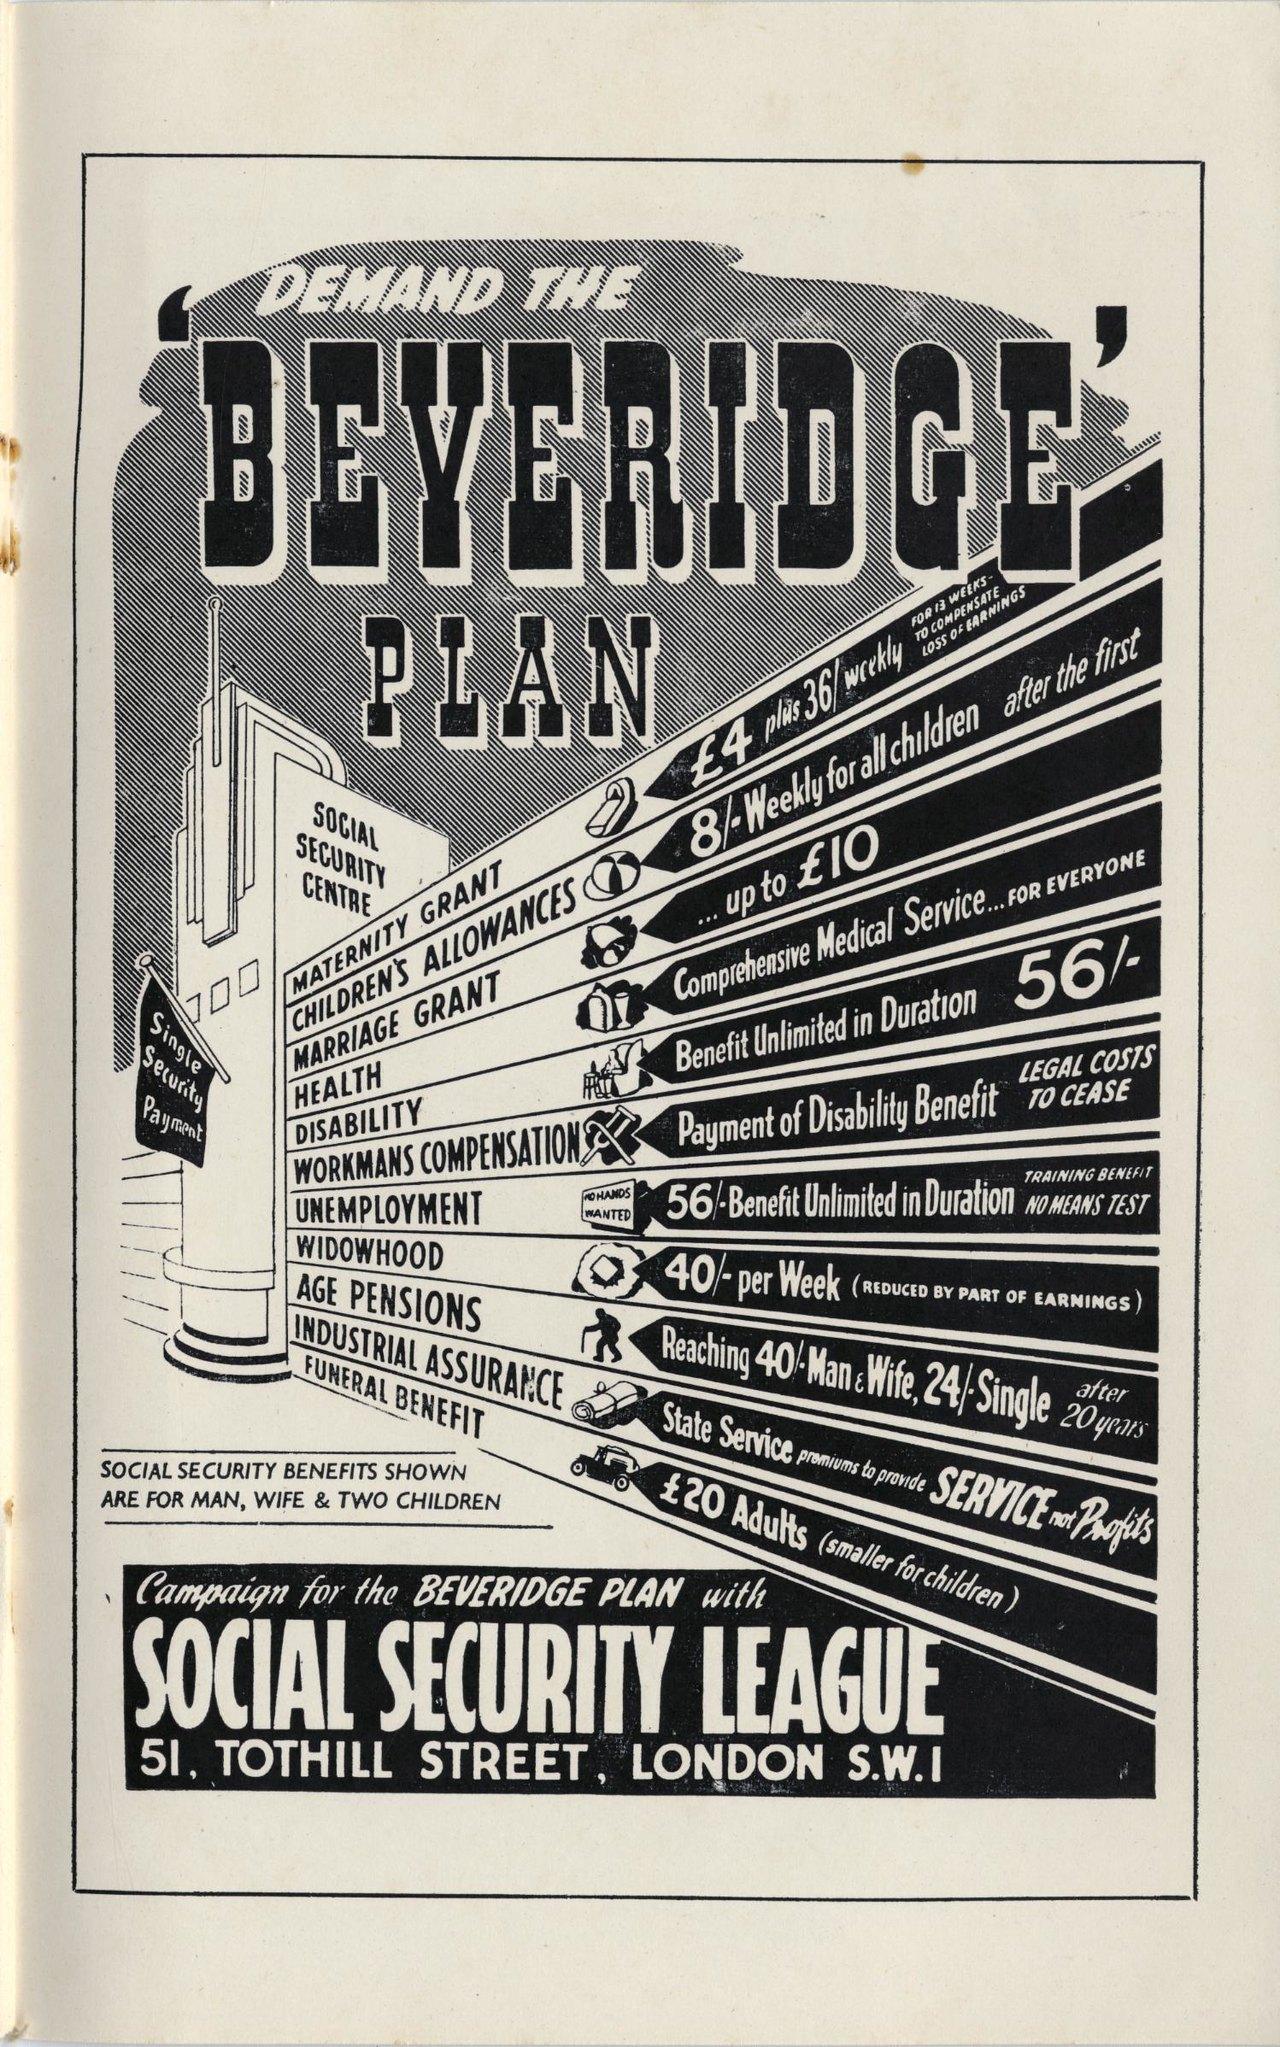 """Demand the Beveridge Plan"", 1944"